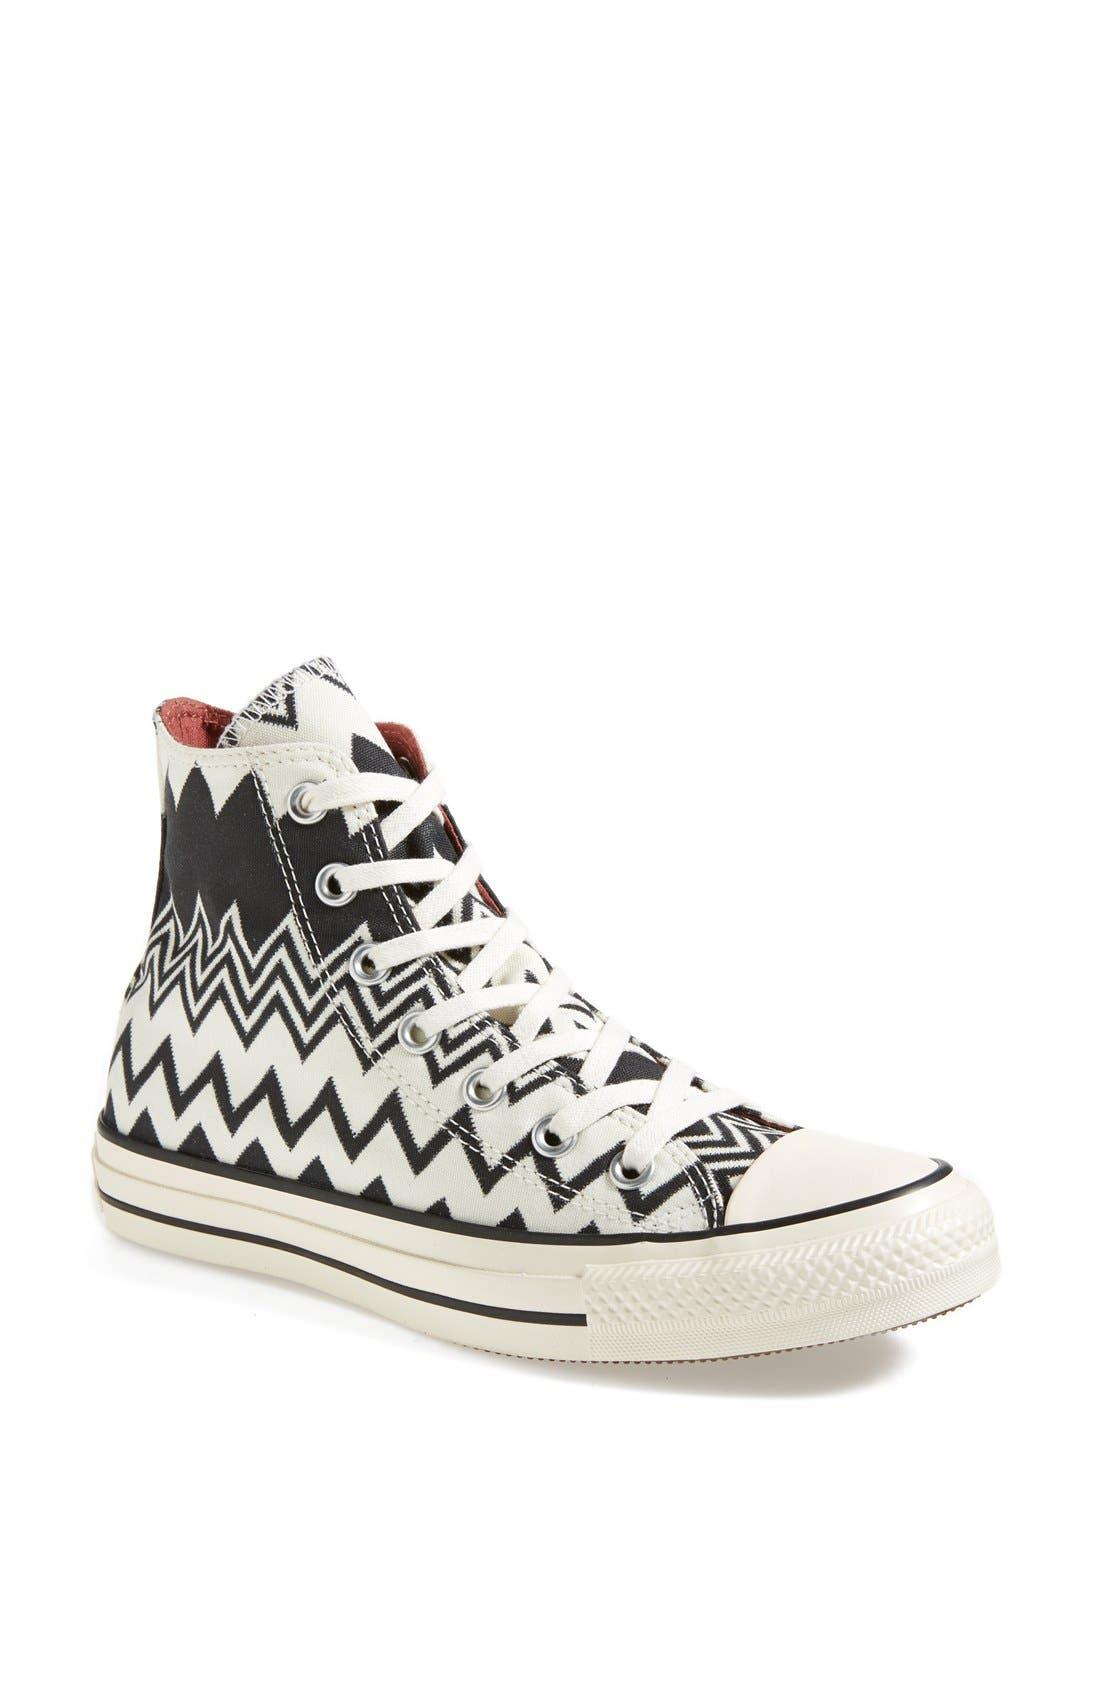 Main Image - Converse x Missoni Chuck Taylor® All Star® High Top Sneaker (Women)